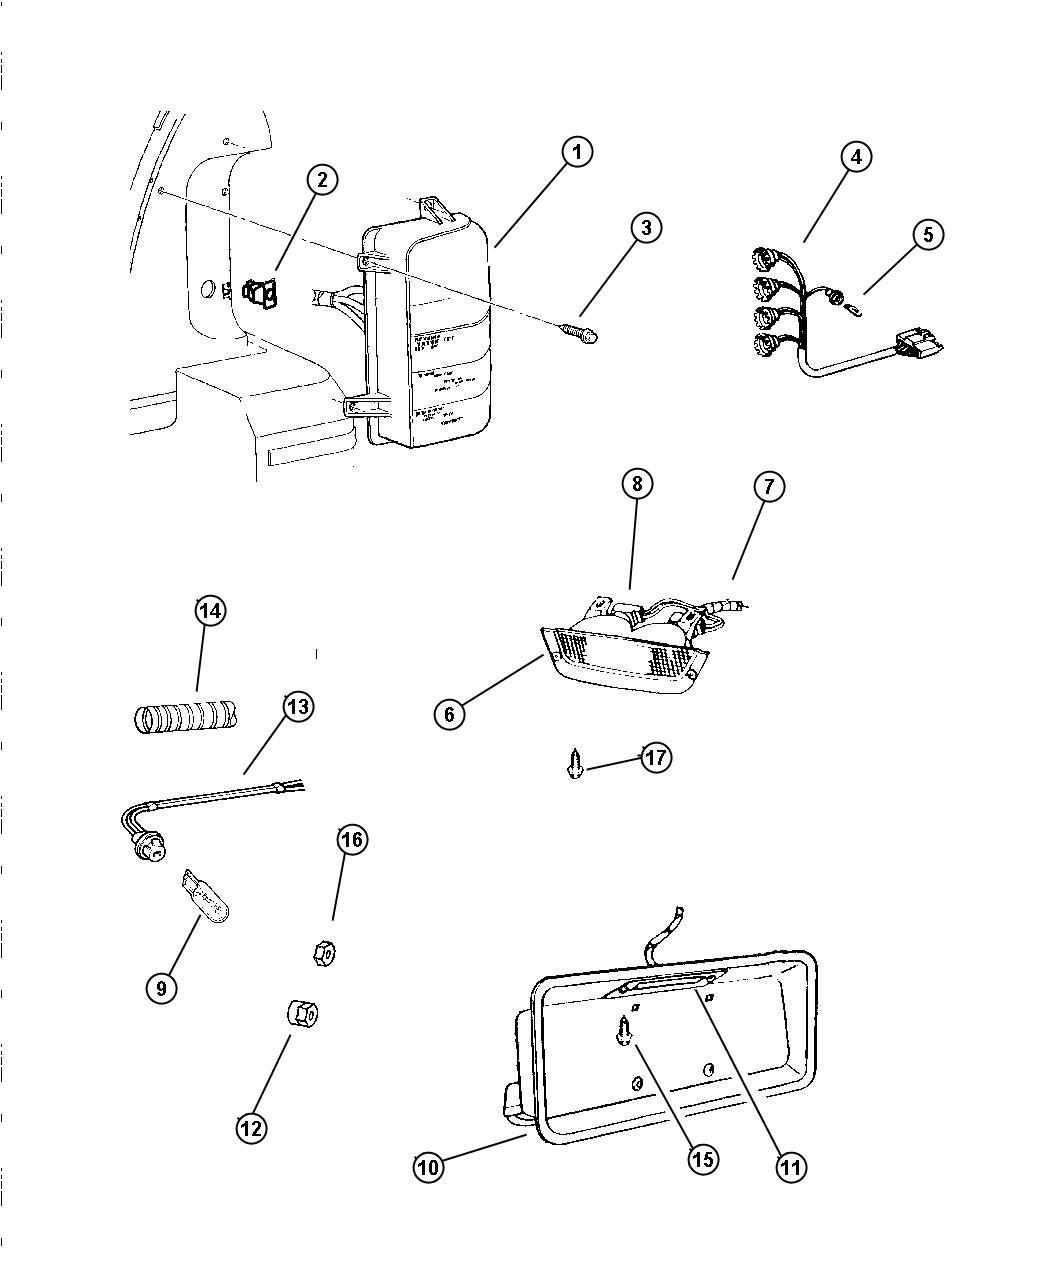 01 Jeep Grand Cherokee Rear Lamp Wiring Diagram Wiring